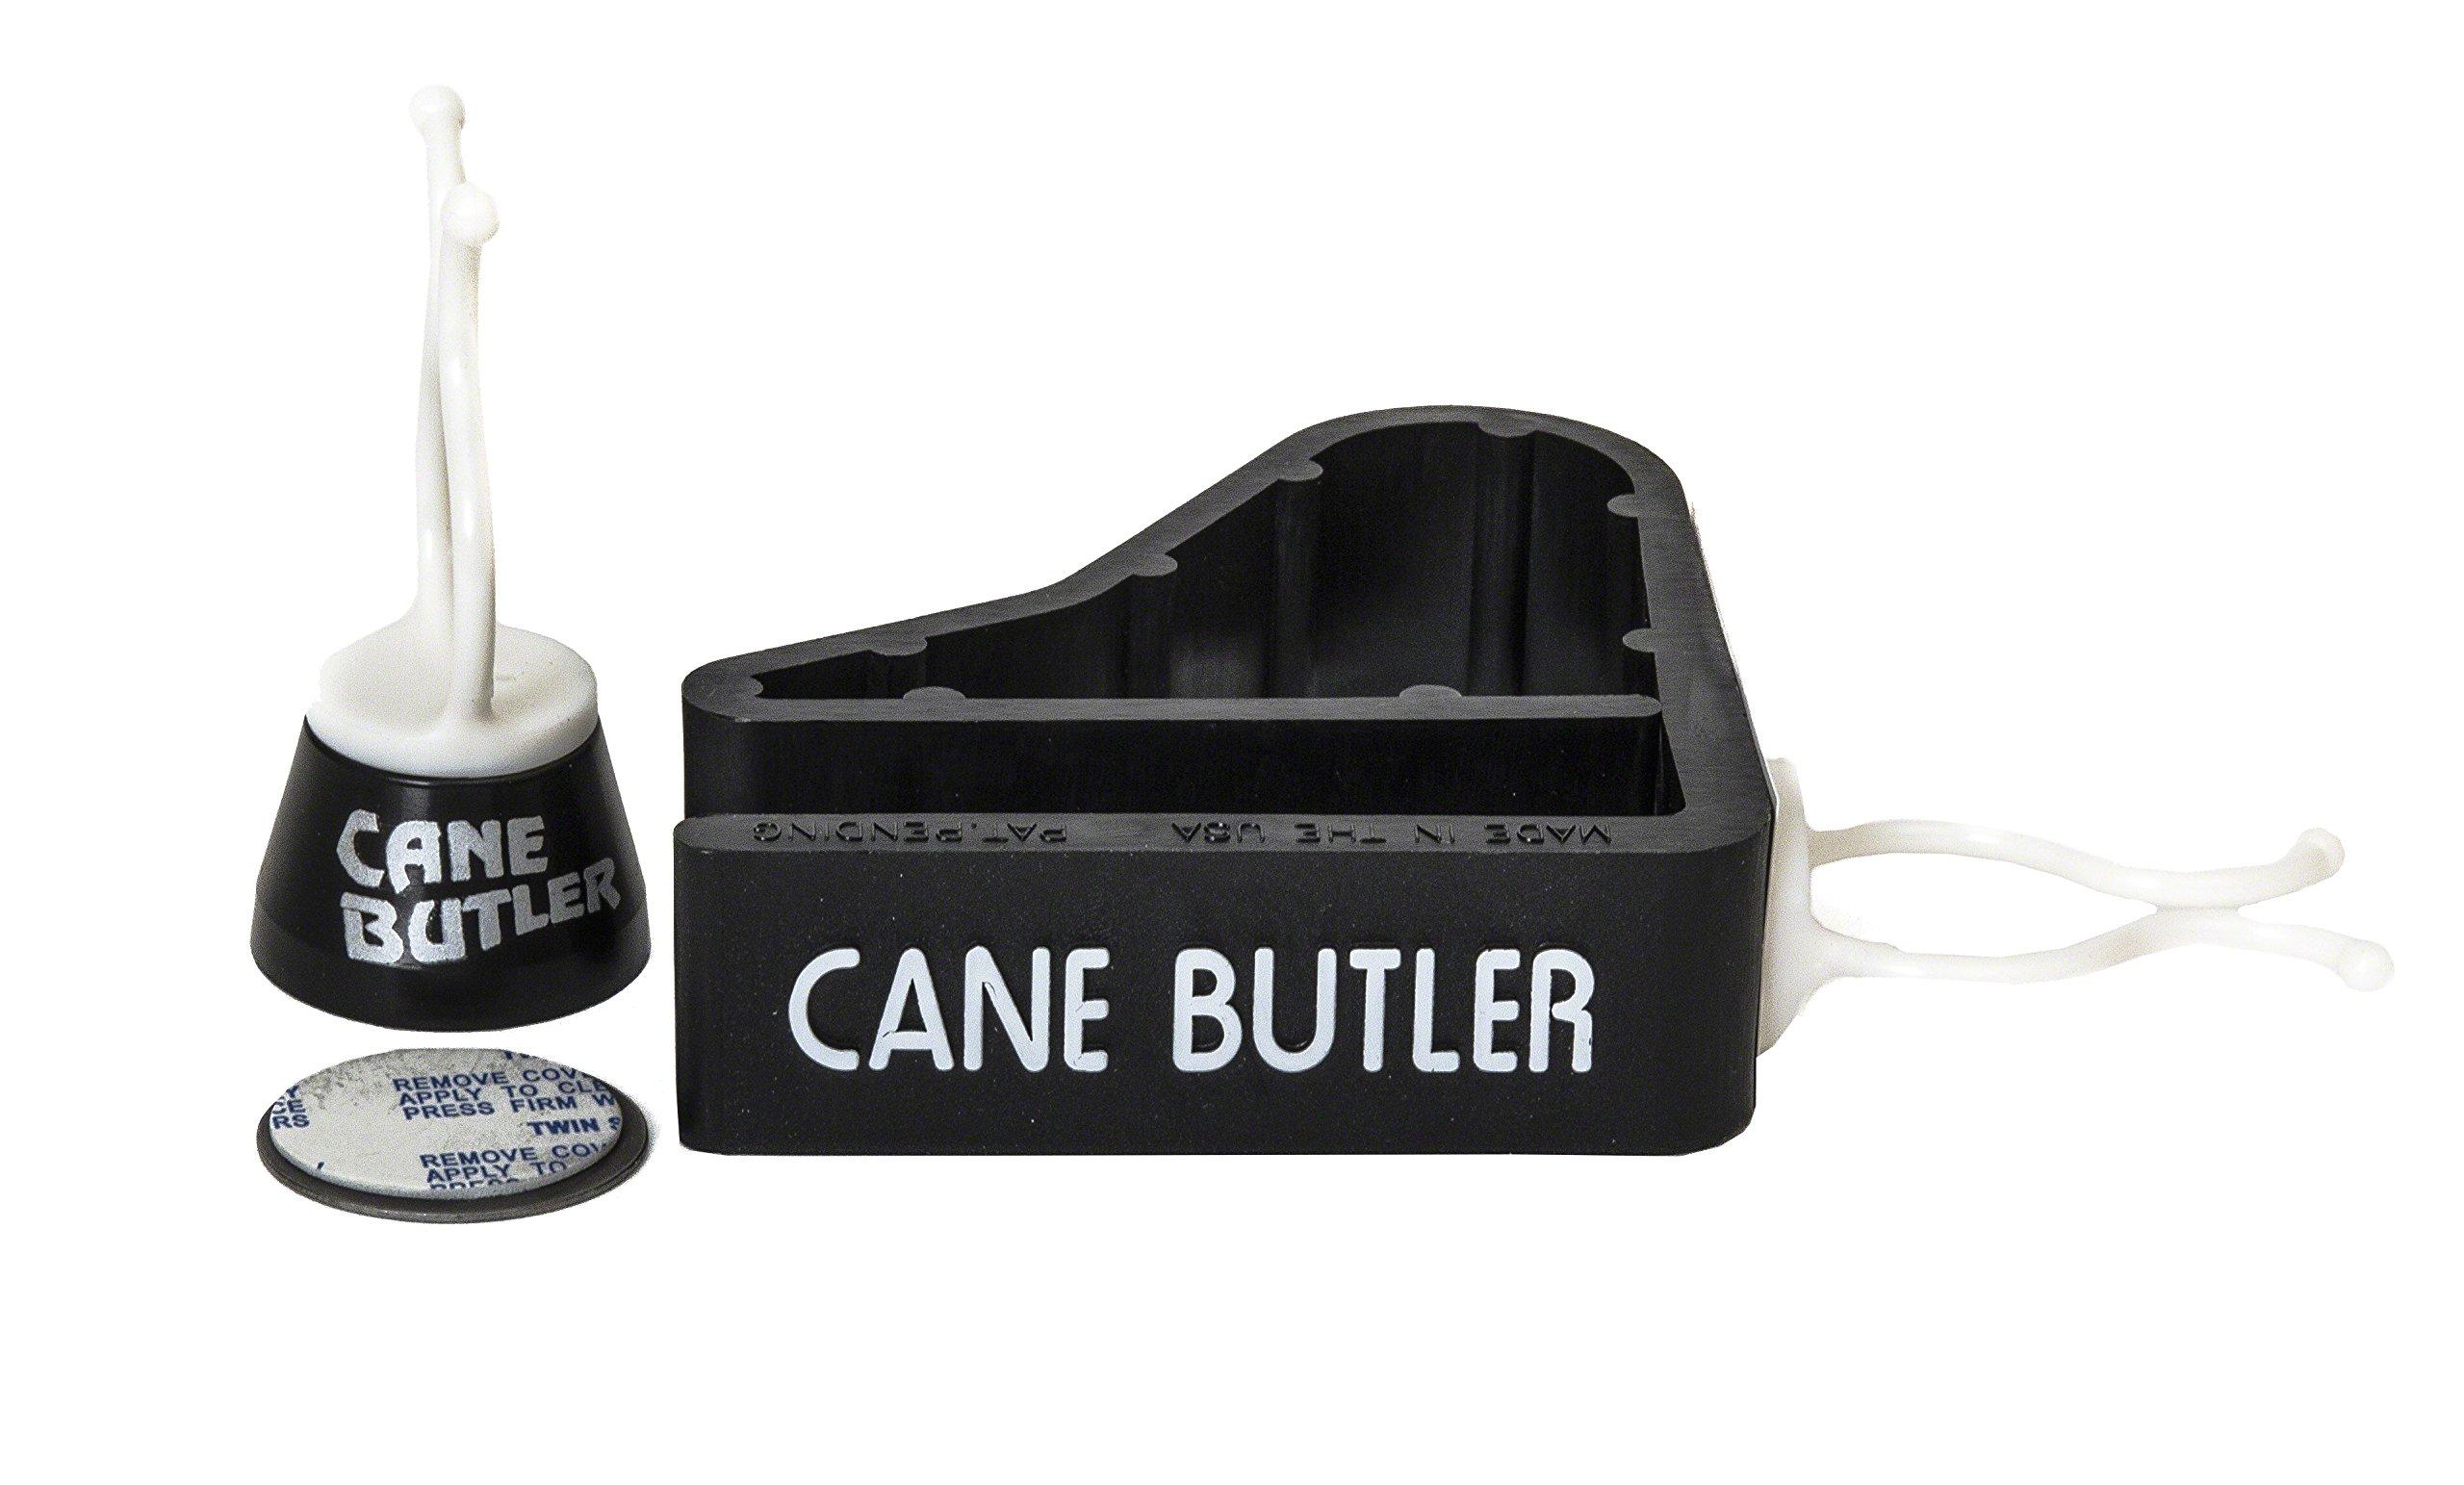 Cane Butler Combo Pack Includes Original Cane Butler, Disk Station, and Magnetic Cane Butler by Cane Butler (Image #4)